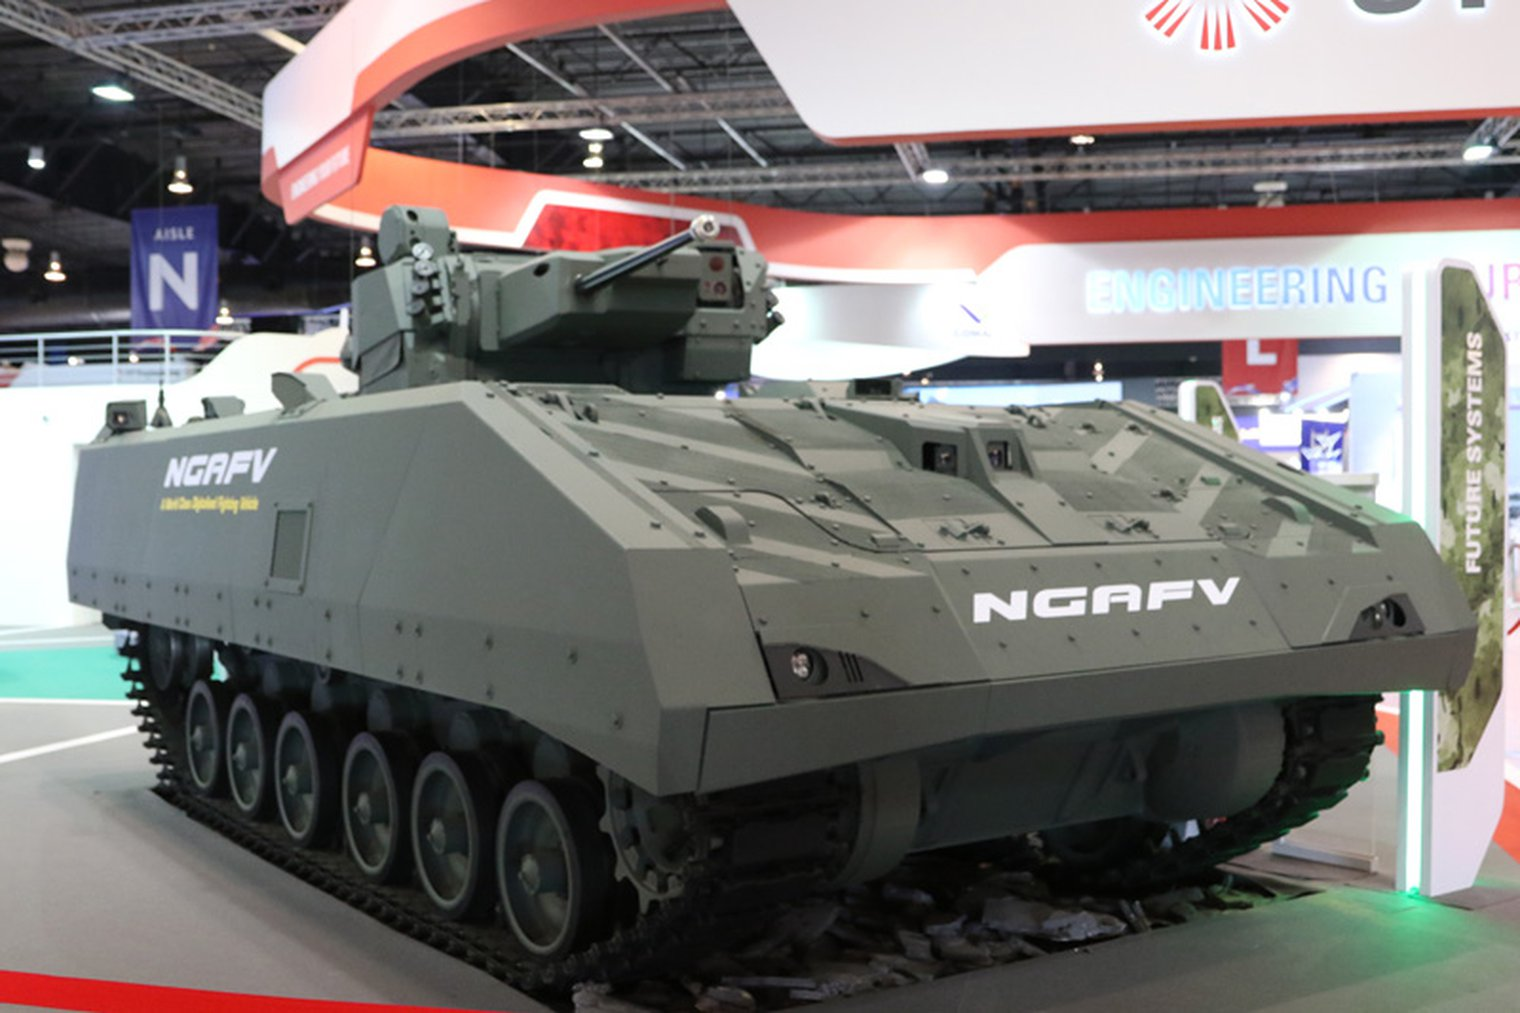 Singapore Airshow 2018 Ngafv To Reach Singapore Army Next